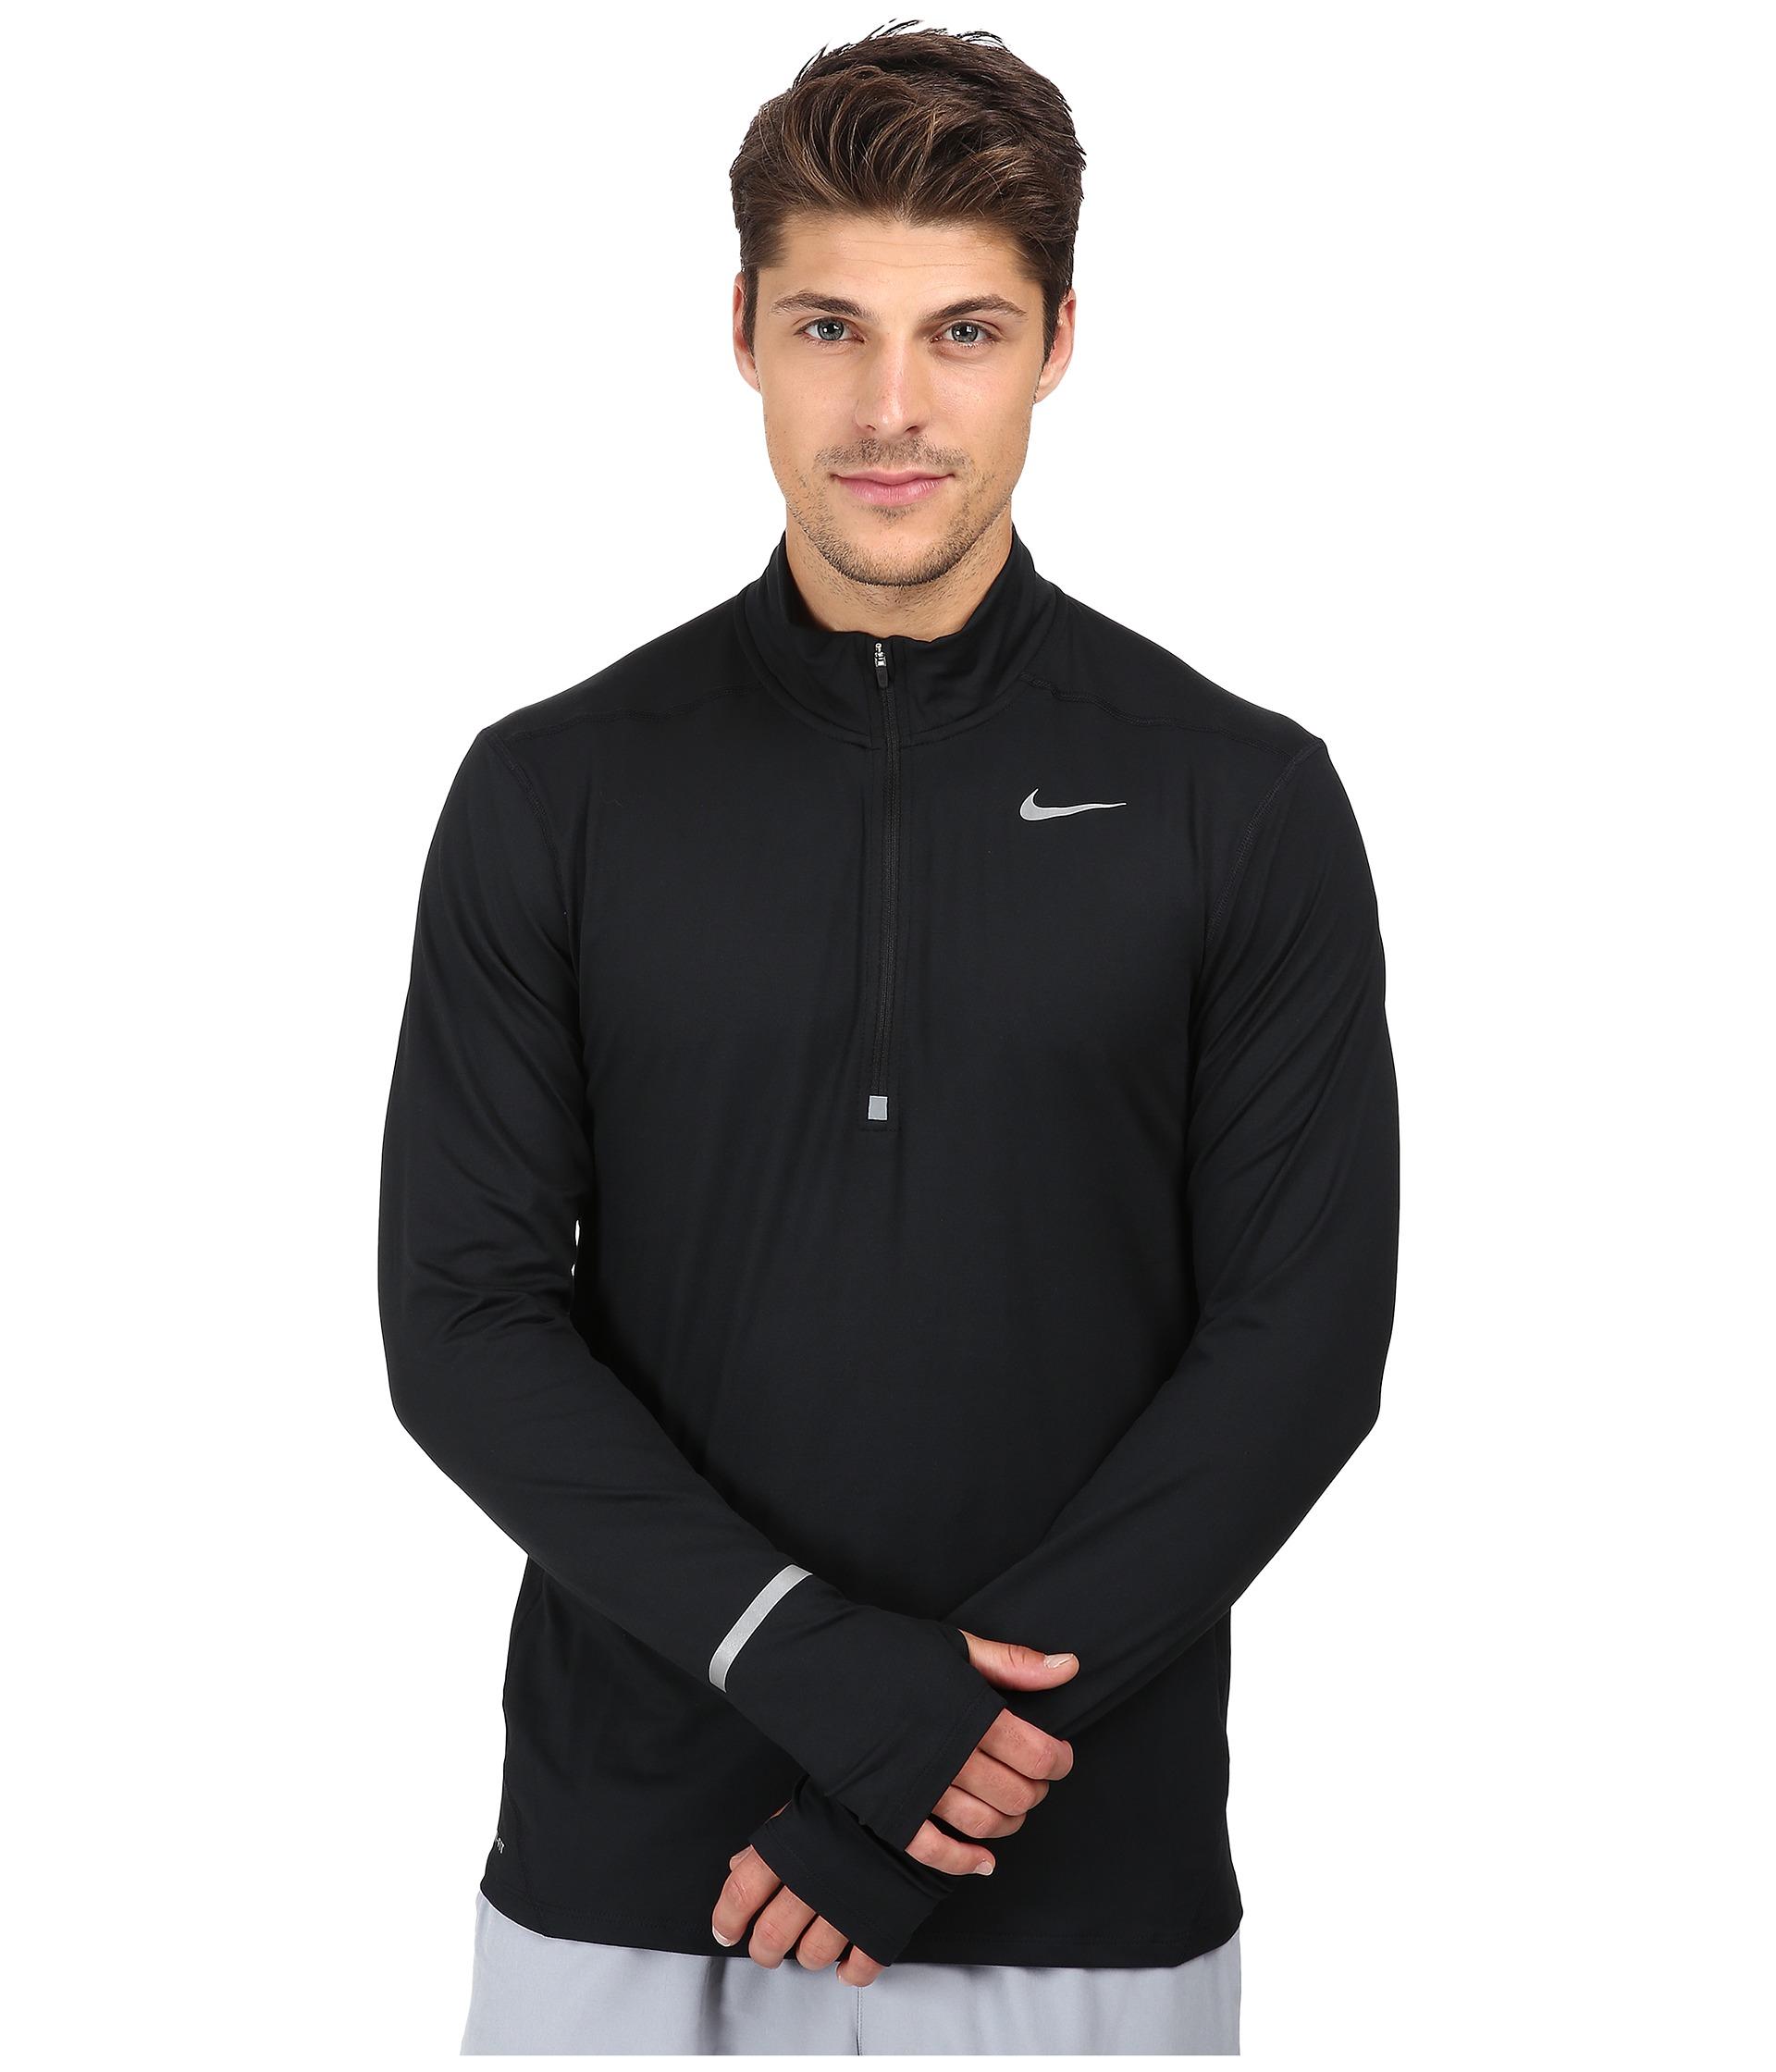 Nike element jacket men's - Nike Element Jacket Men's 21